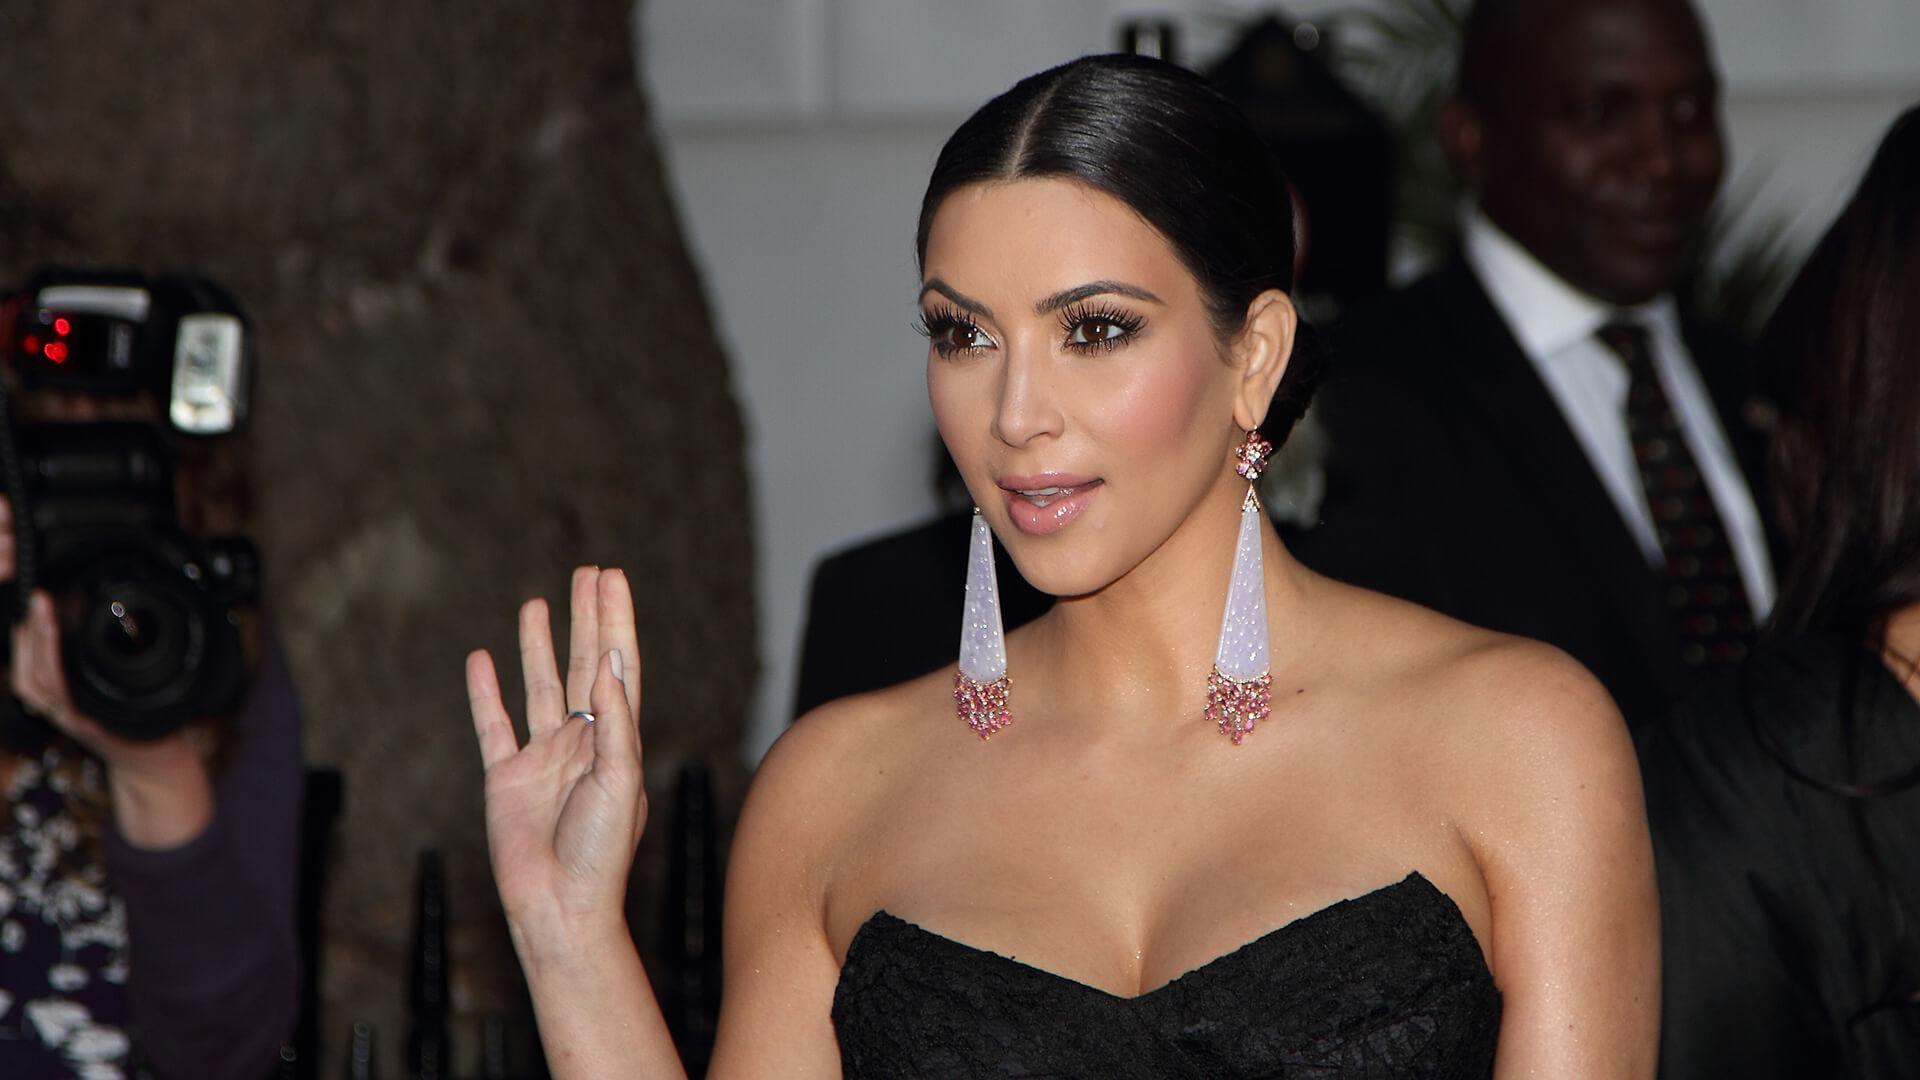 Bing's Top Searches In 2014: Kim Kardashian No. 1 Most